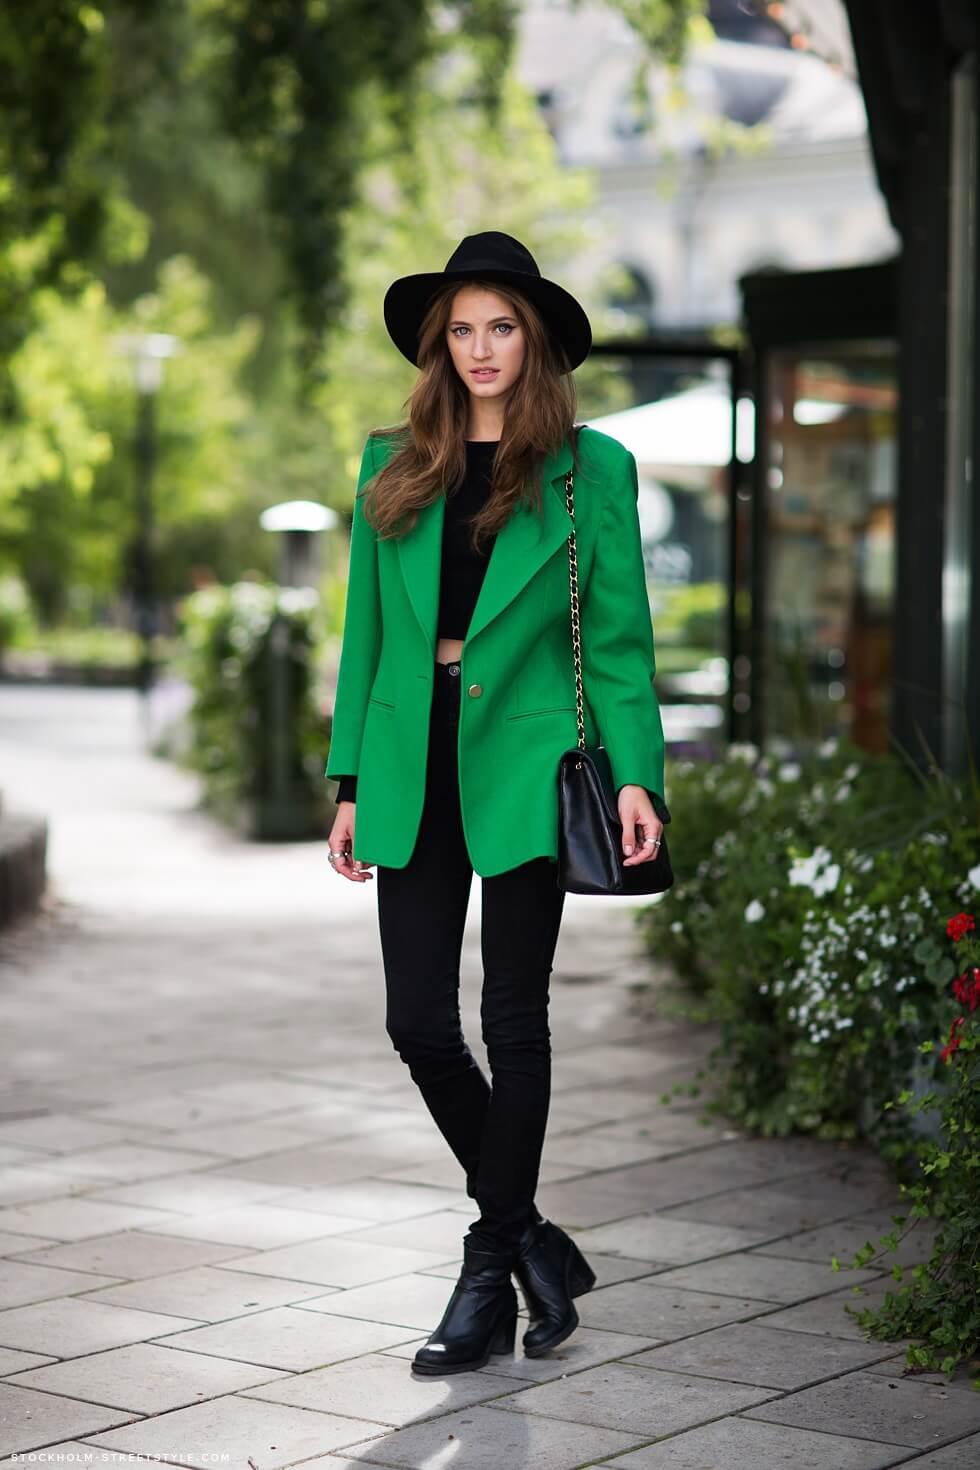 07 - tumblr - green blazer stylish st patricks outfit ideas